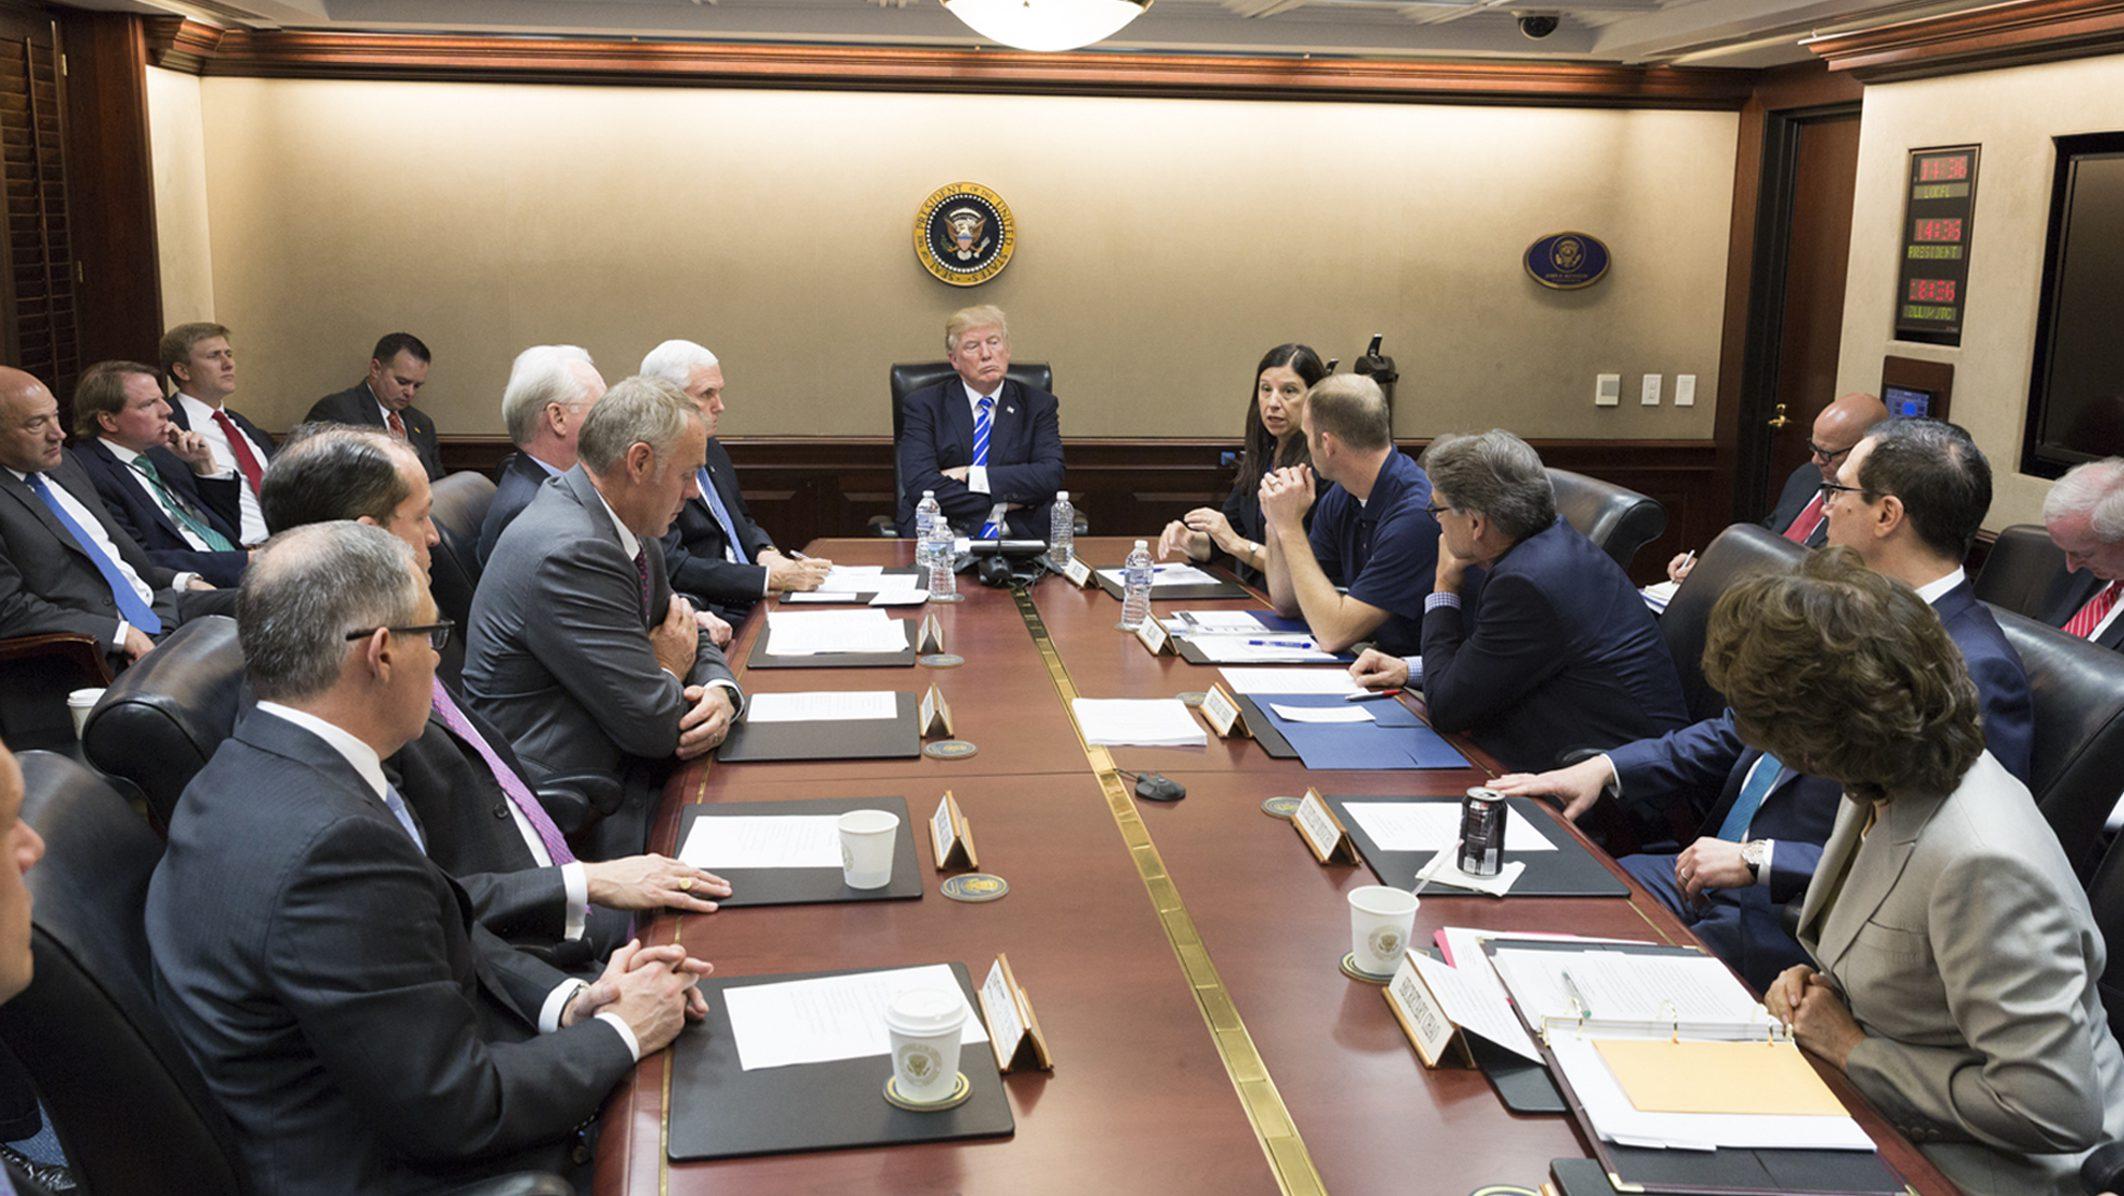 Donald Trump Situation Room